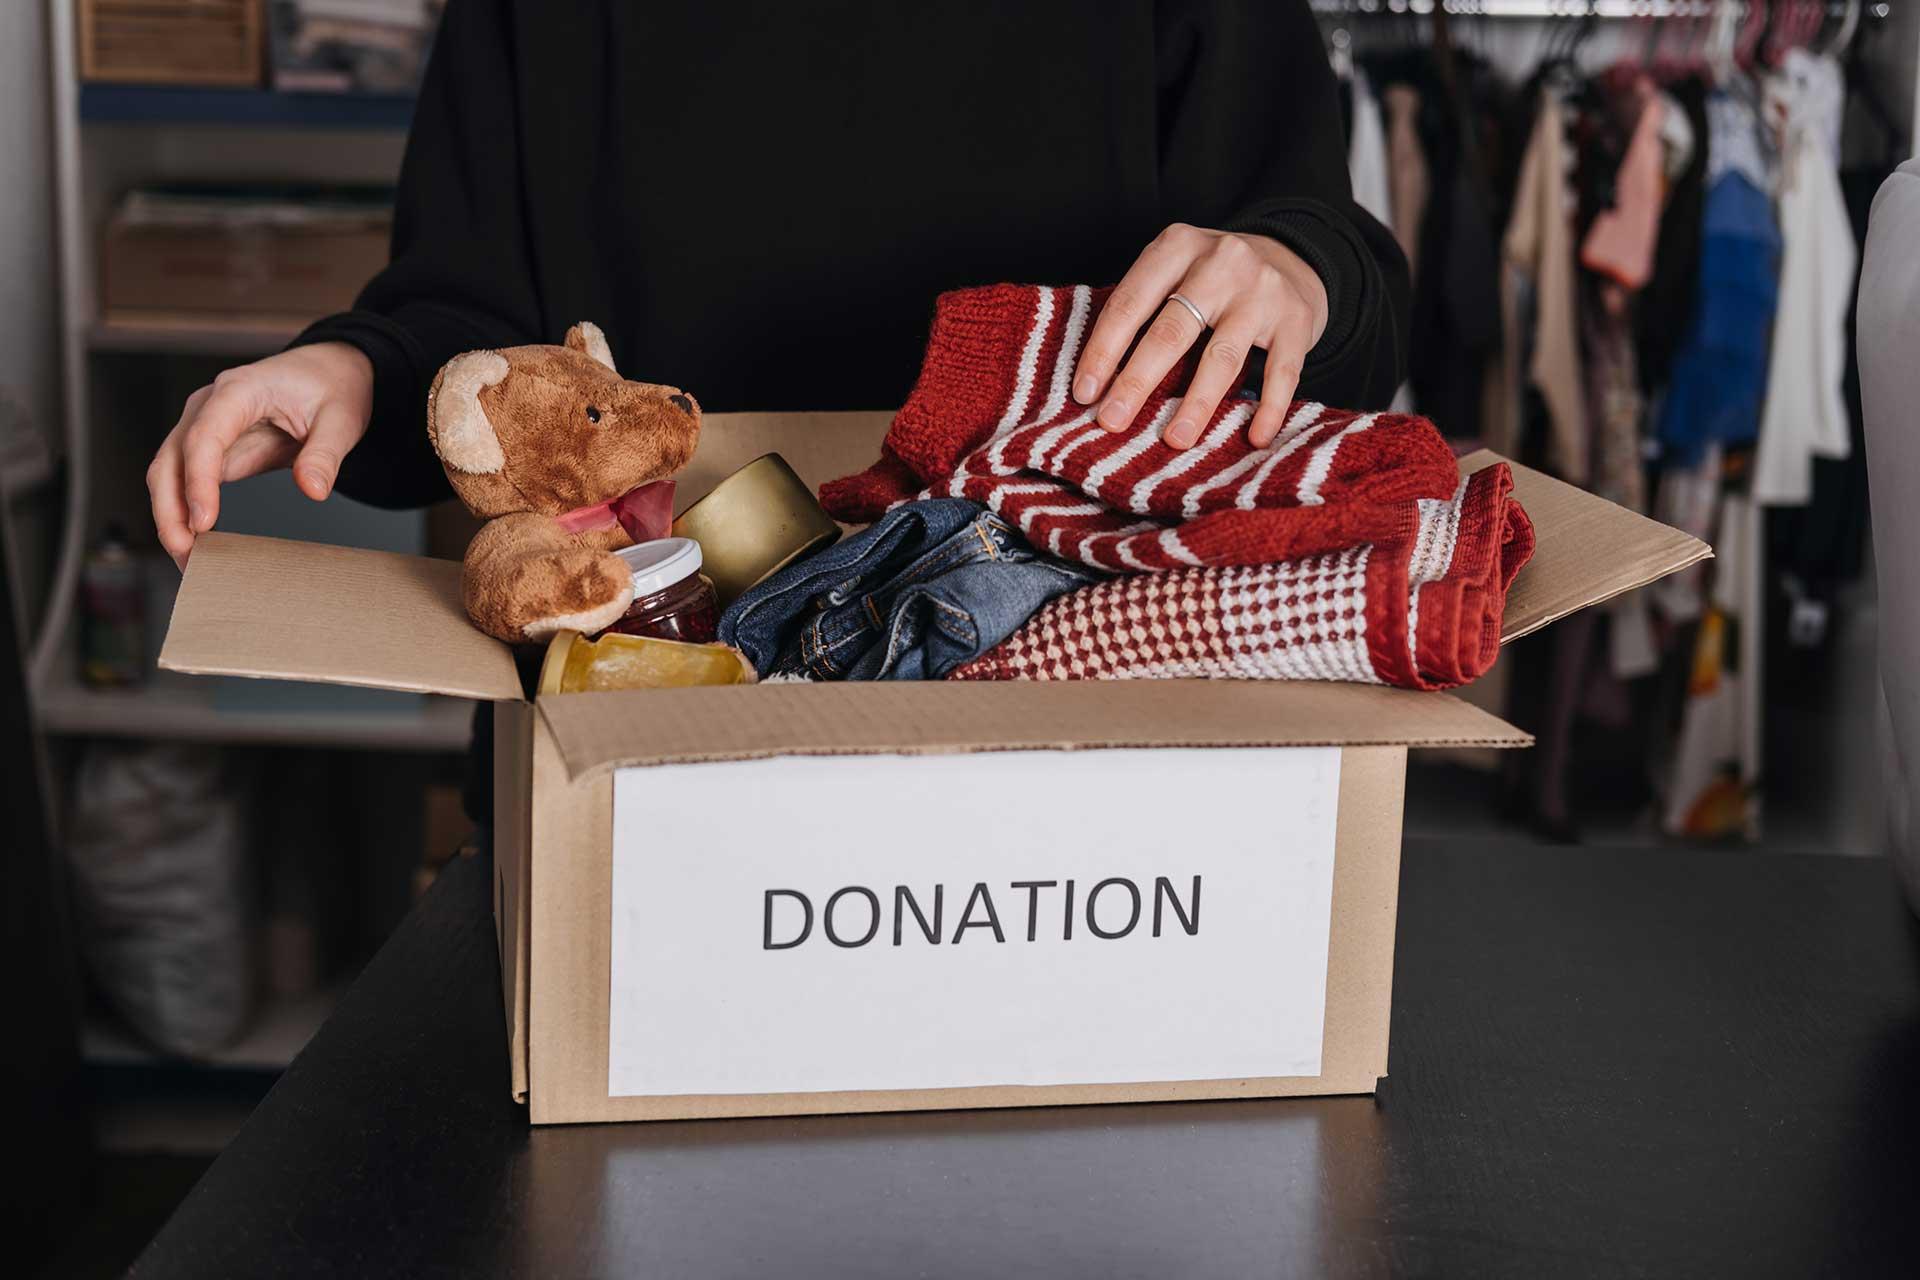 http://digitus-accountancy.com/wp-content/uploads/2021/06/charity.jpg